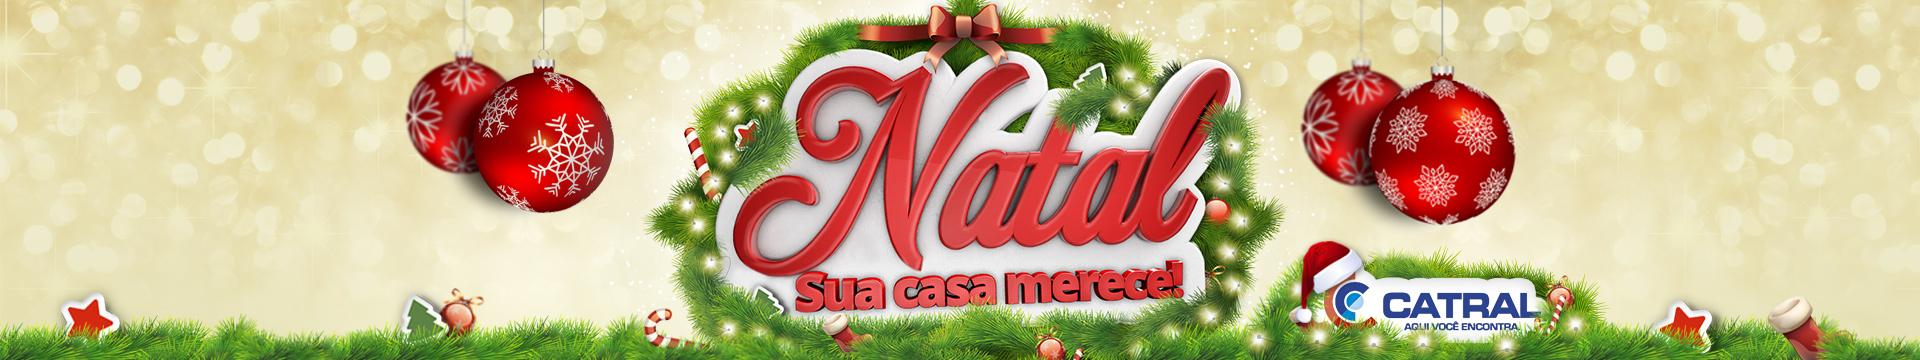 Natal - Capa